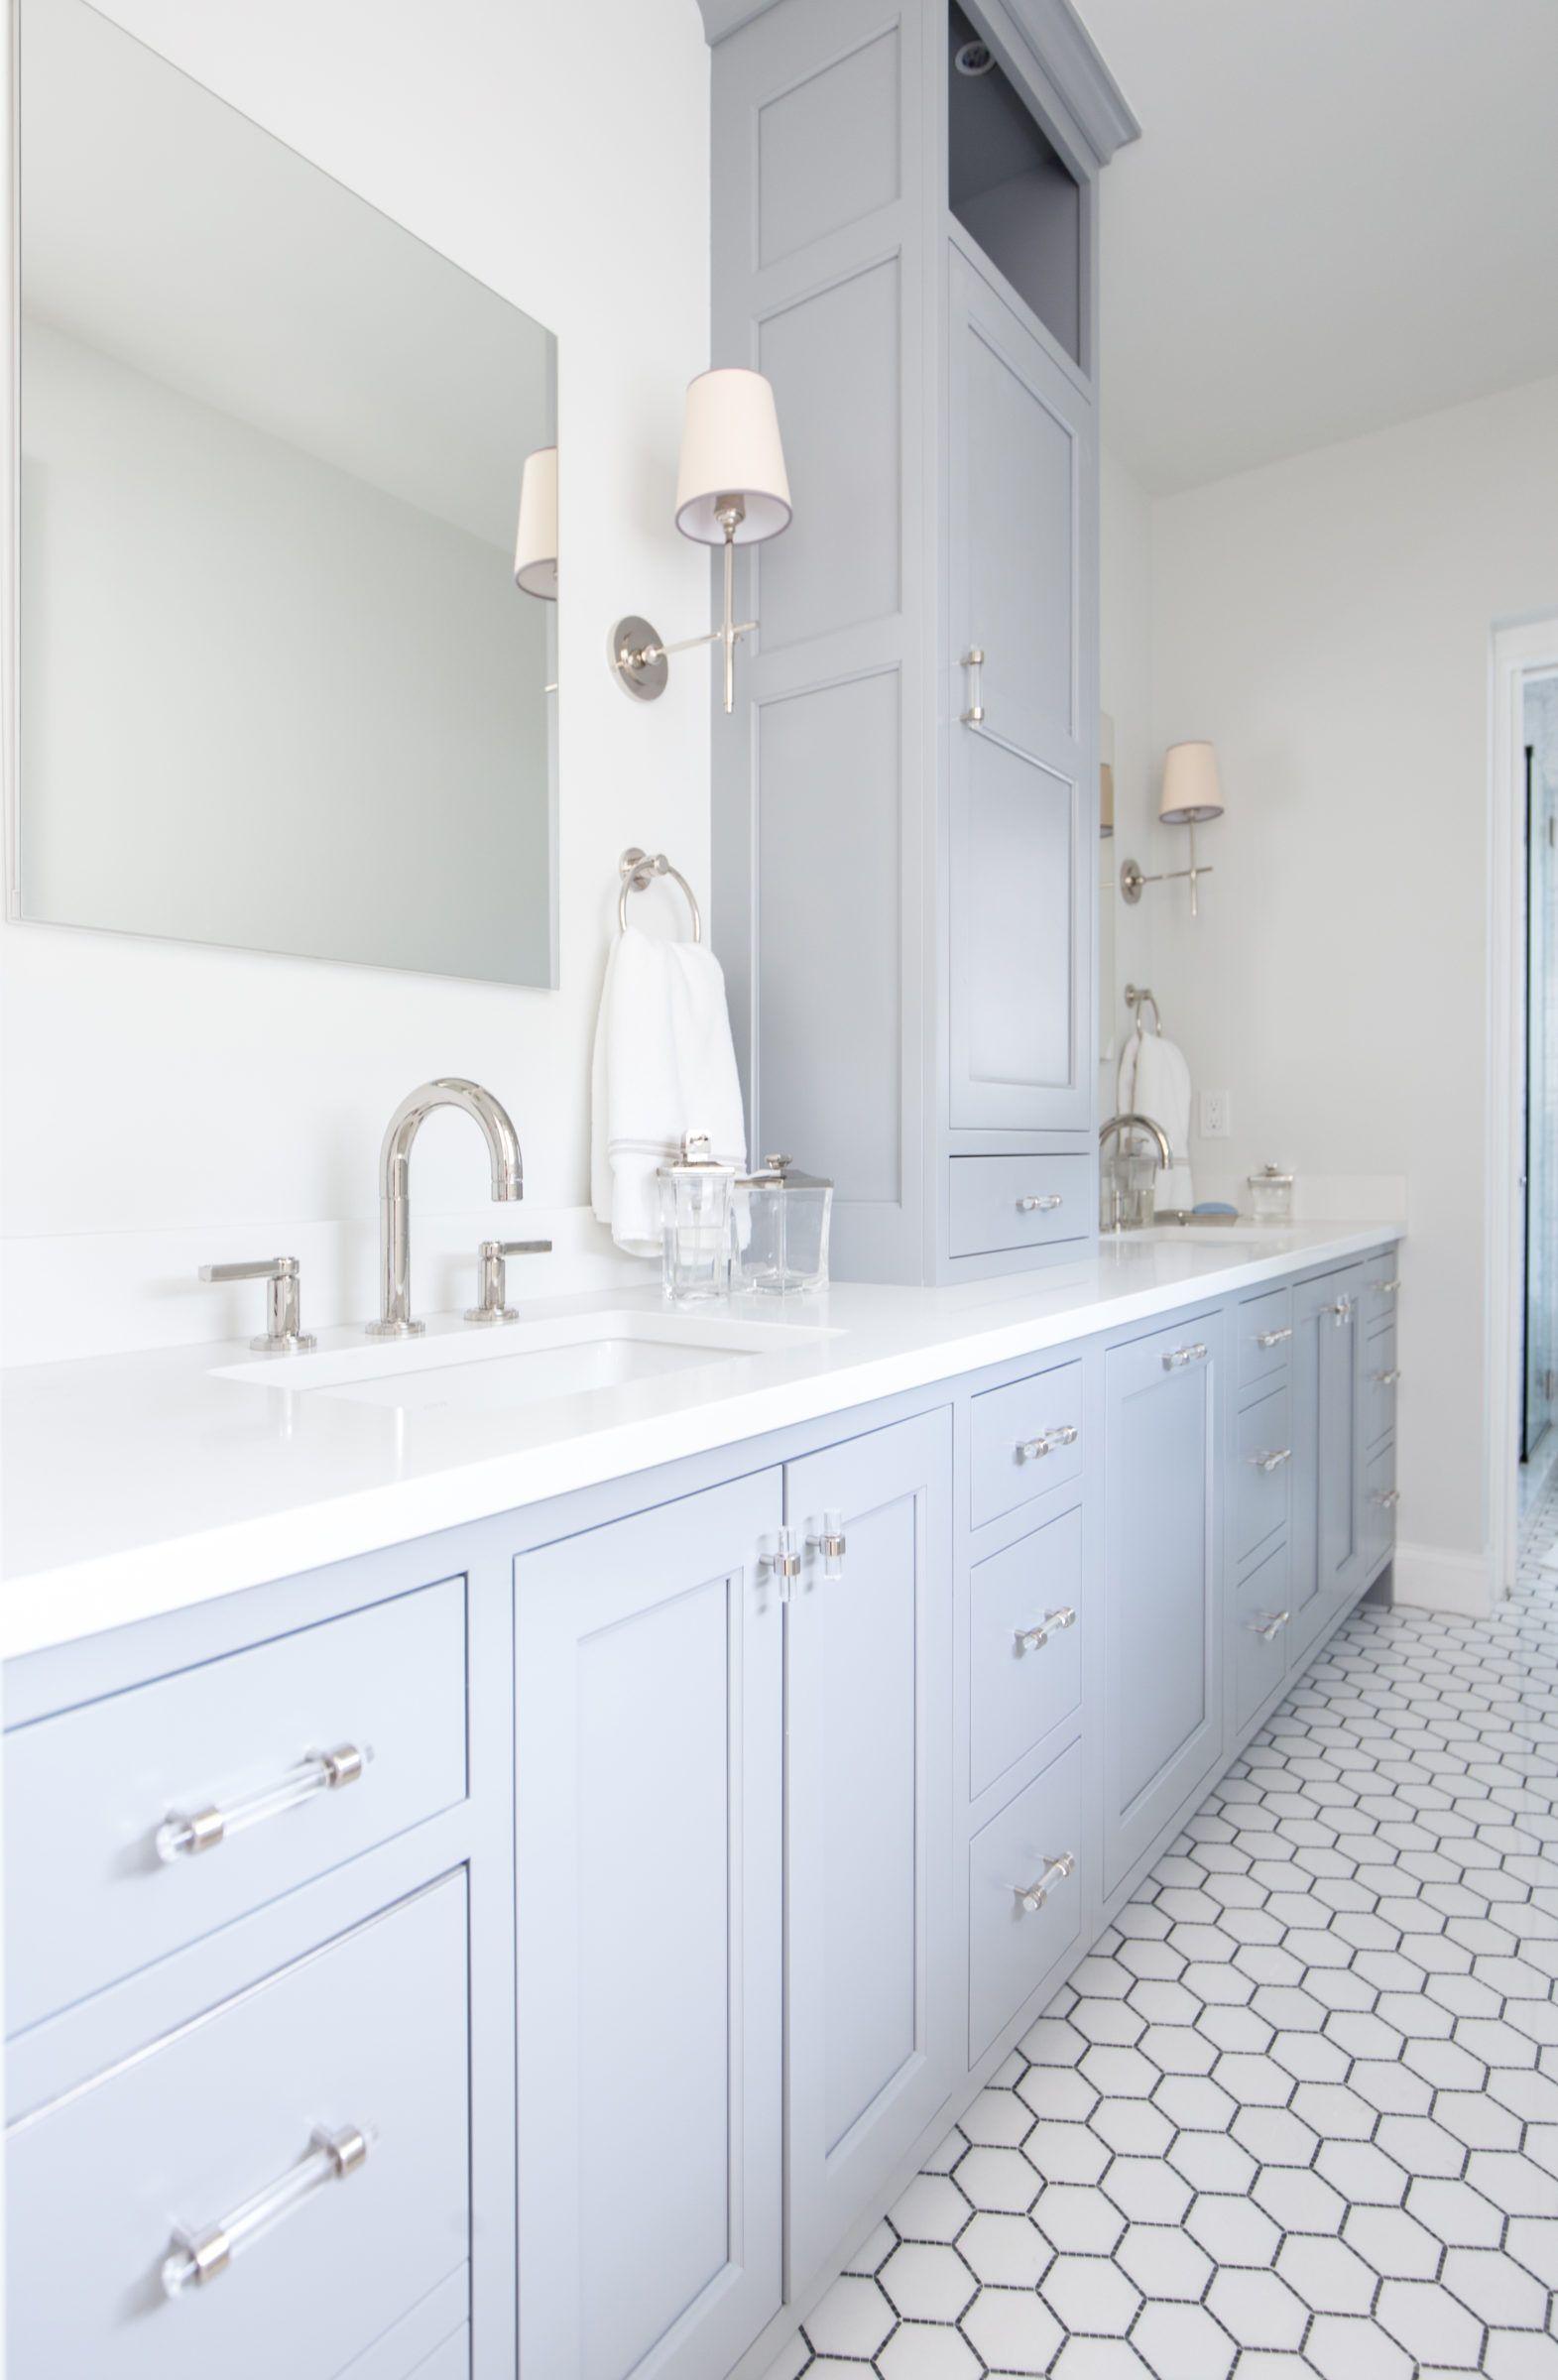 Bathroom Design & Other Spaces   Bathroom designs, Design projects ...